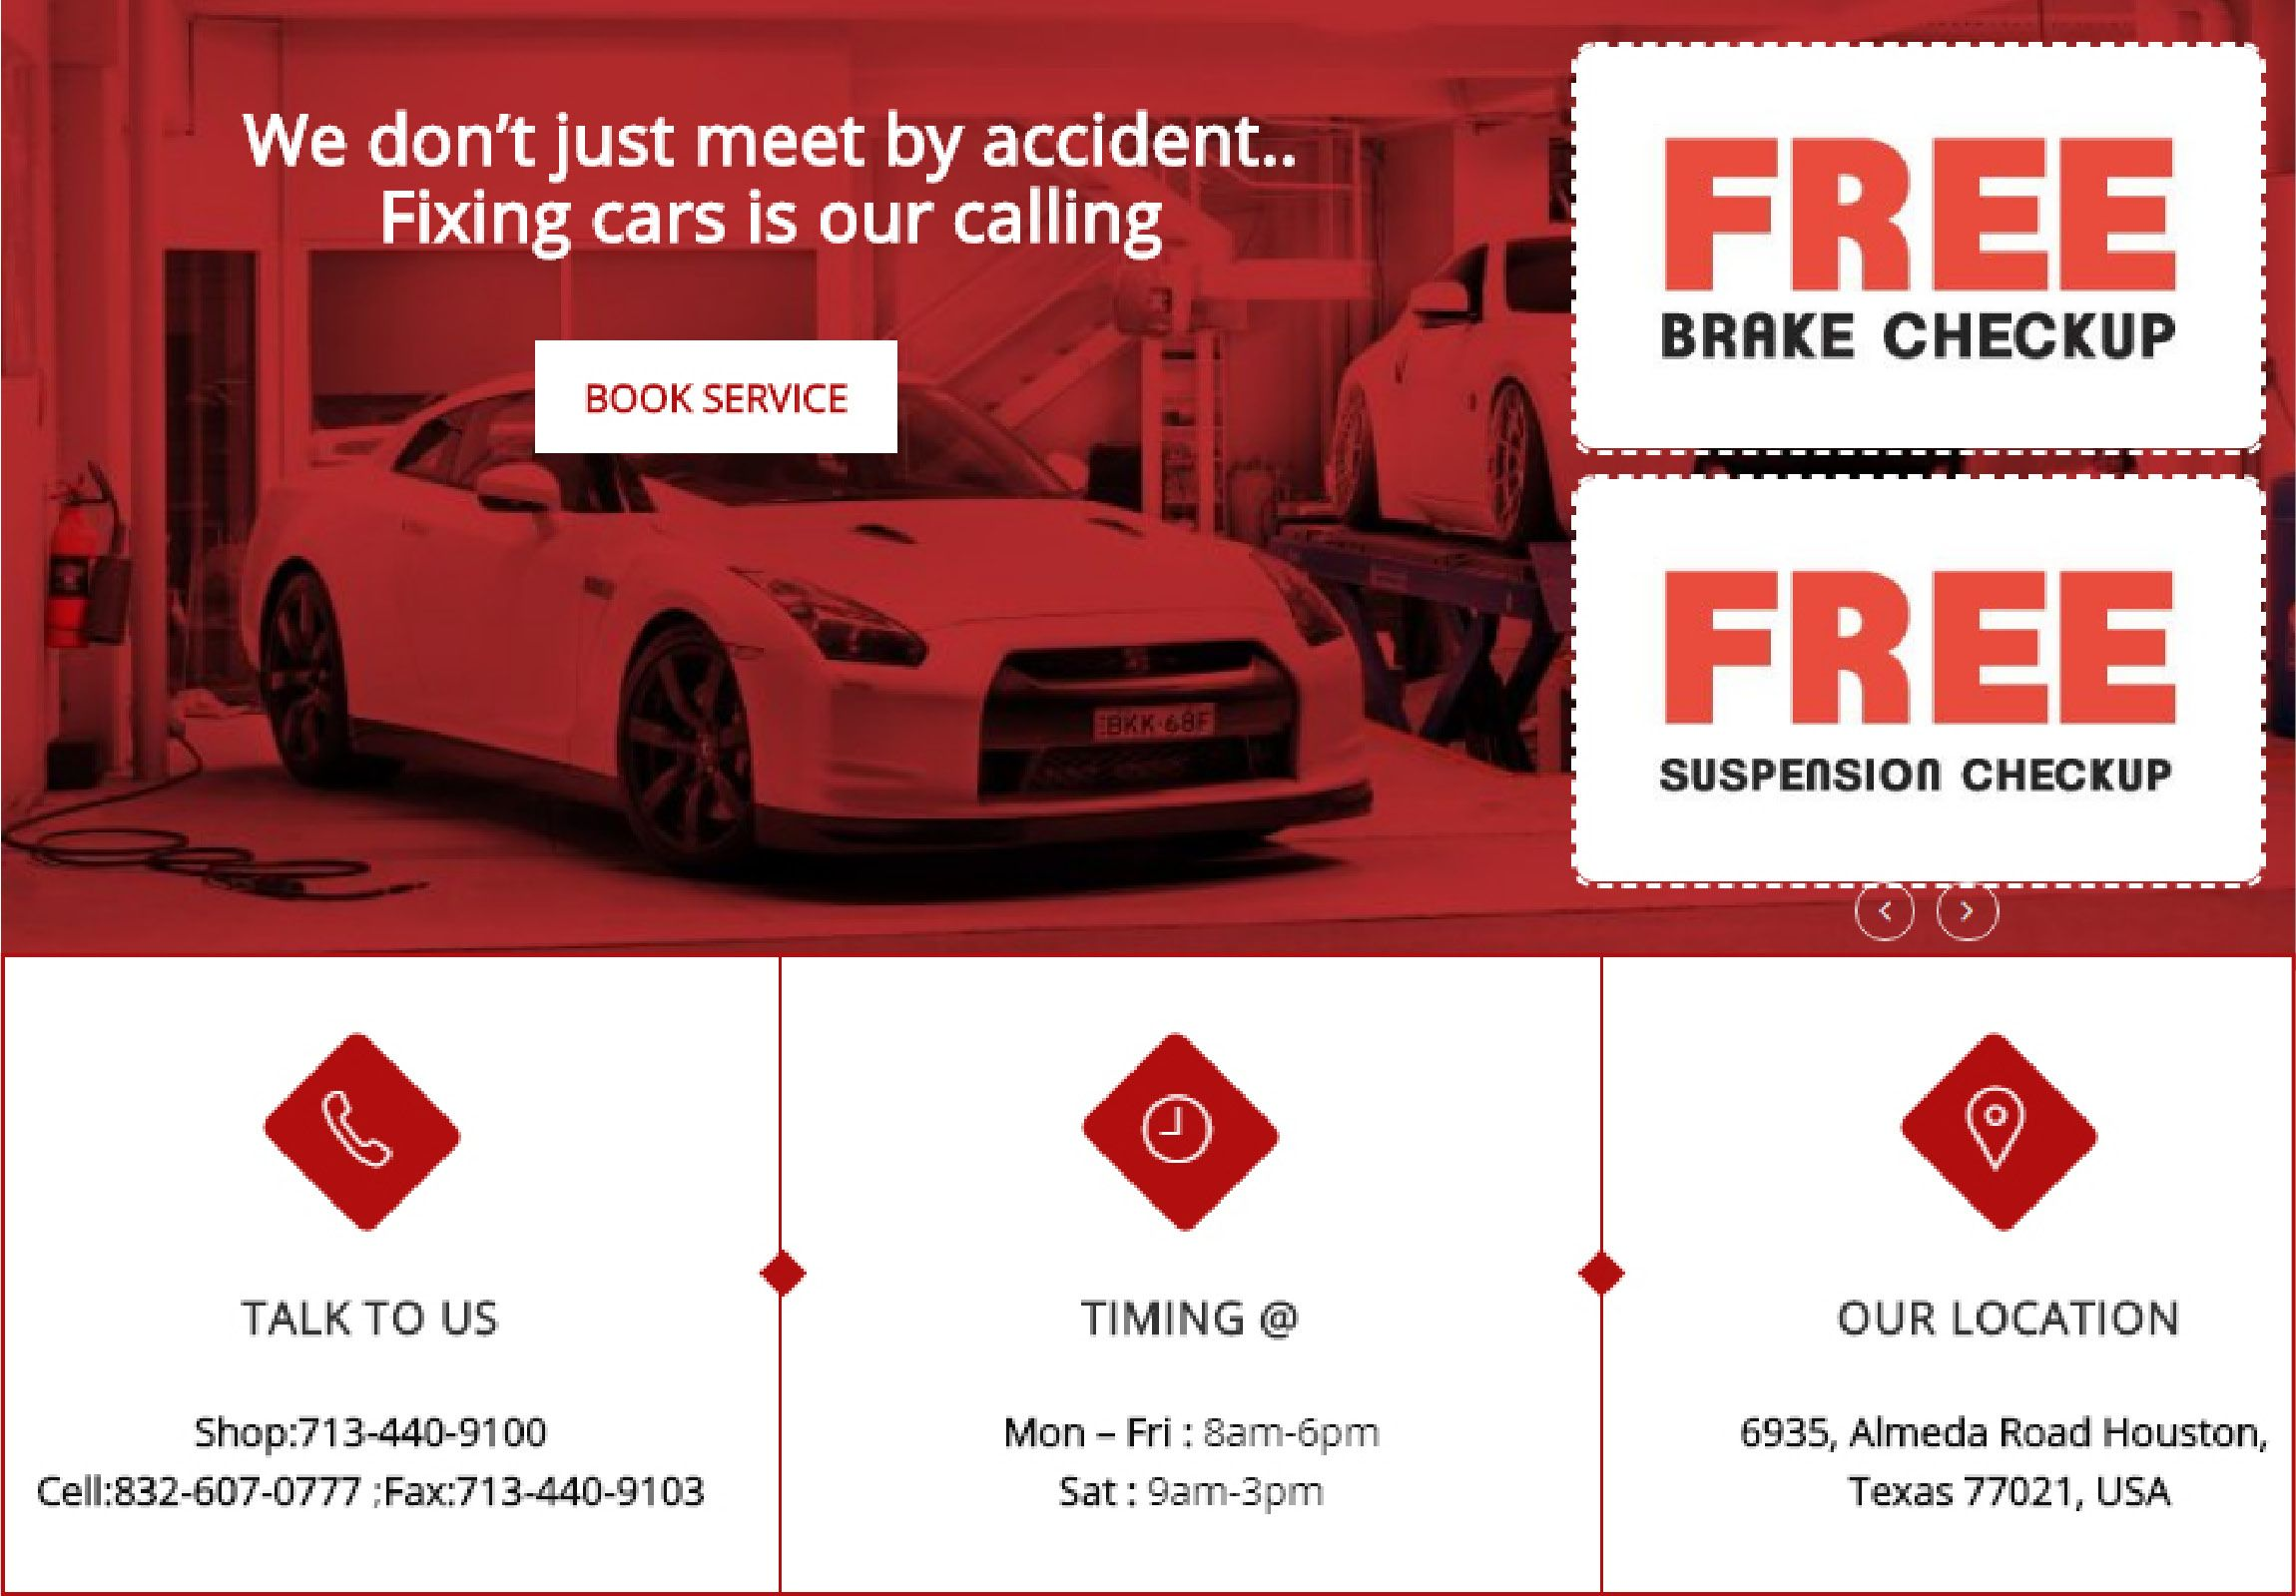 Regency Auto Repair Provides Scheduled Maintaince Auto Repair Services Auto Collision Experts Loaner Car Auto Collision Auto Collision Repair Auto Repair